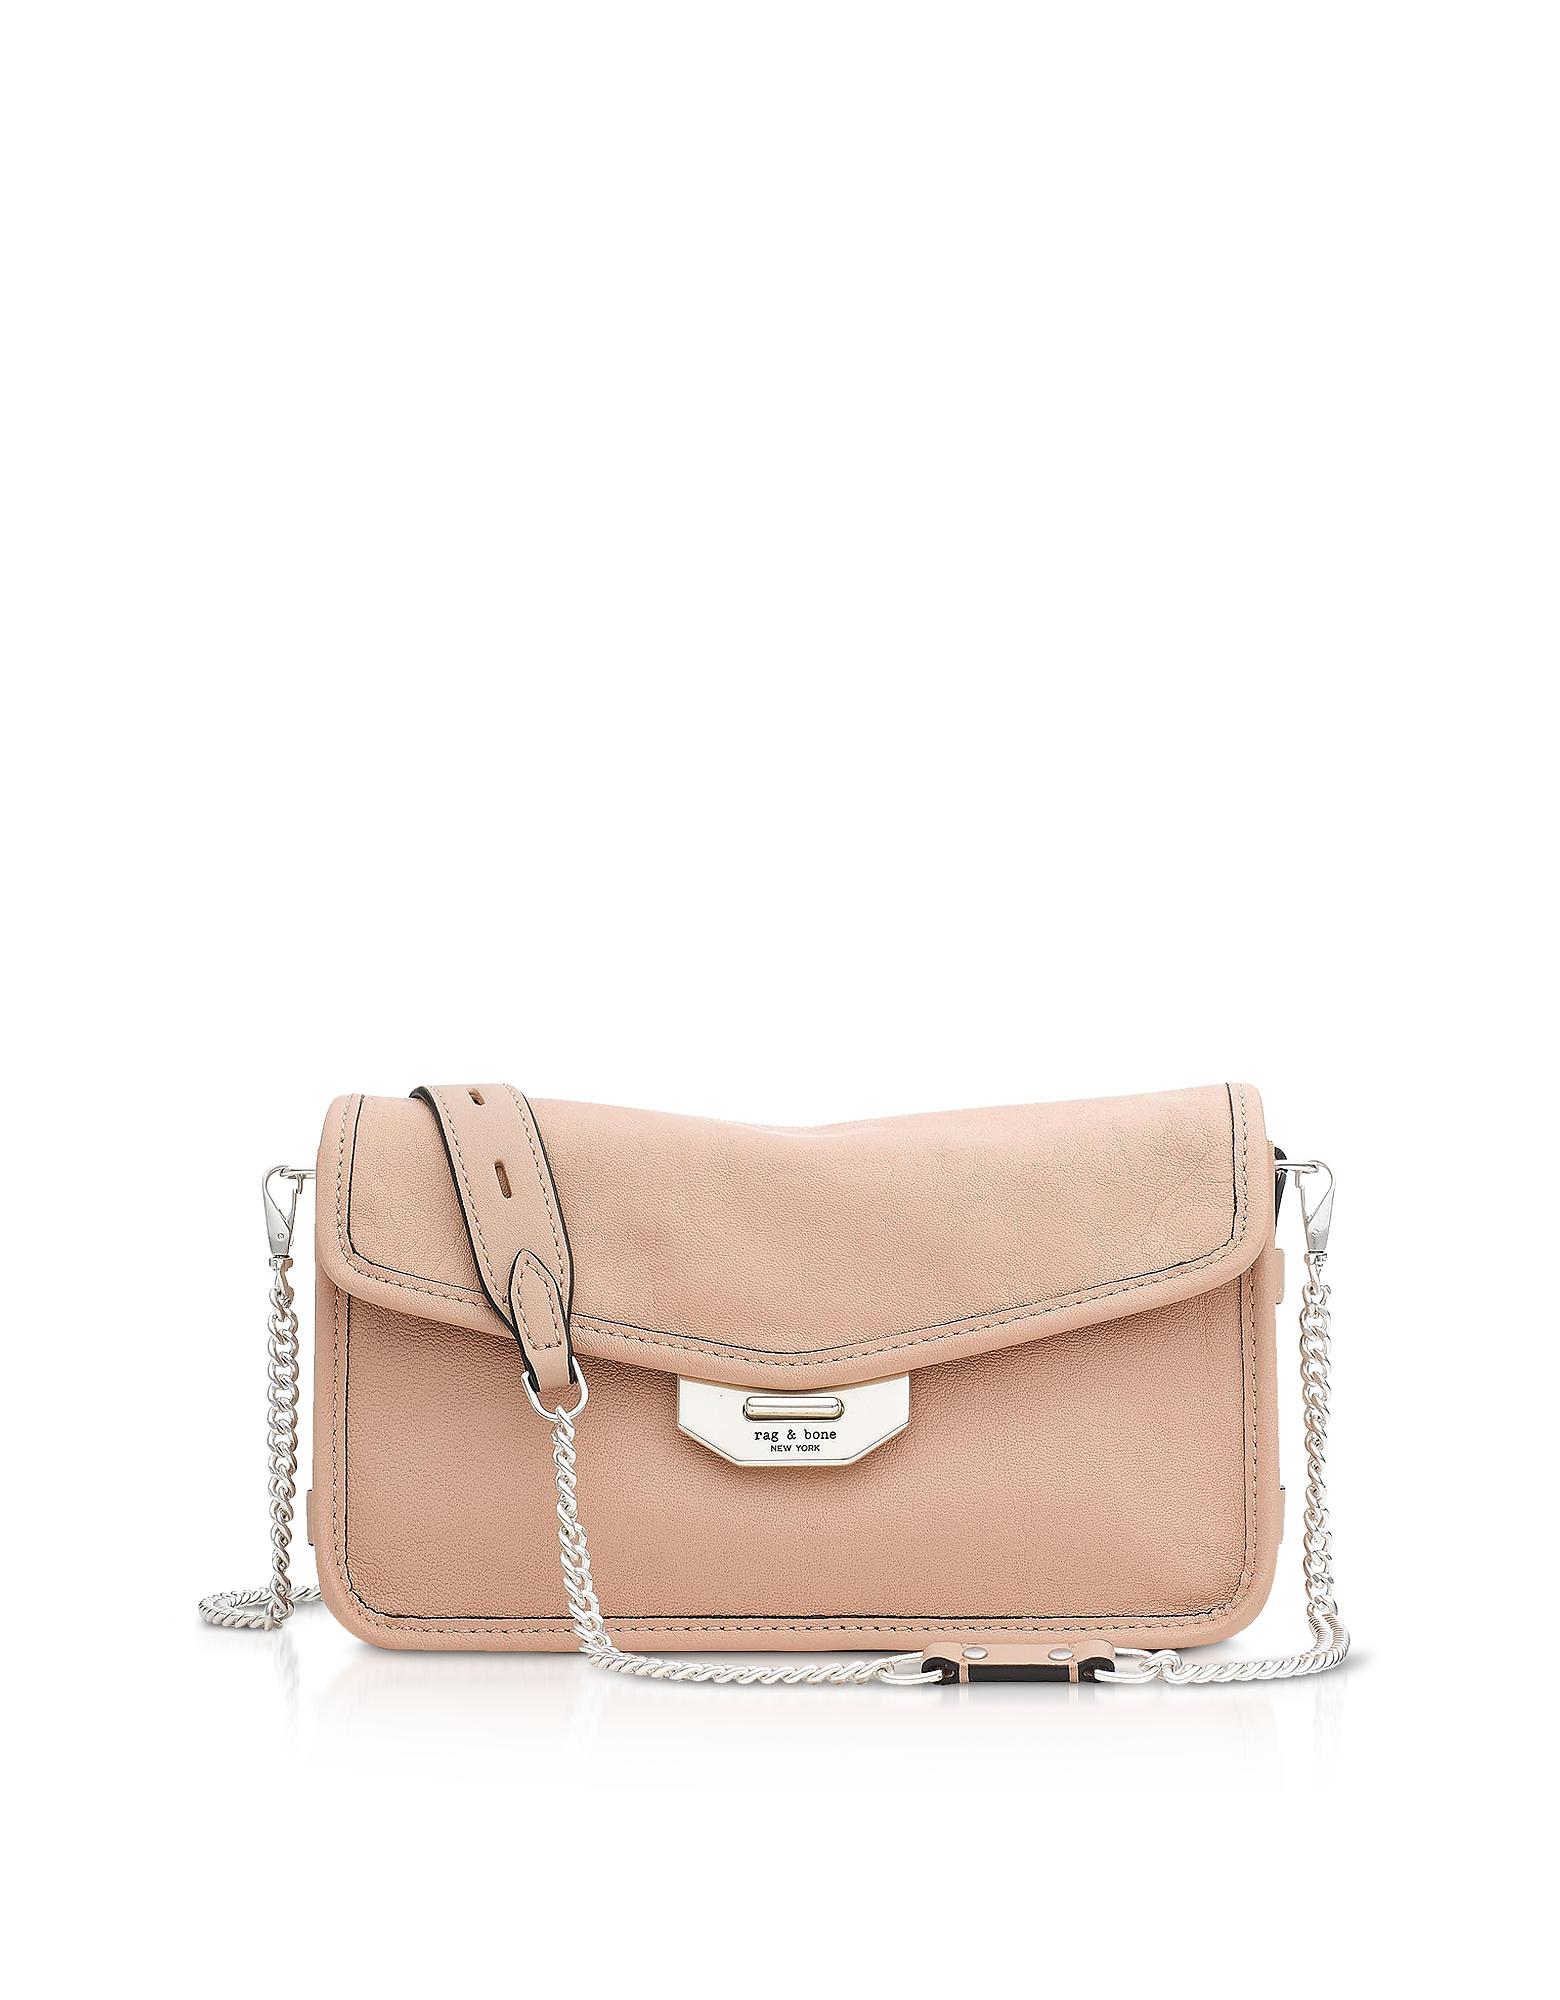 Rag & Bone Handbags, Nude Leather Field Clutch